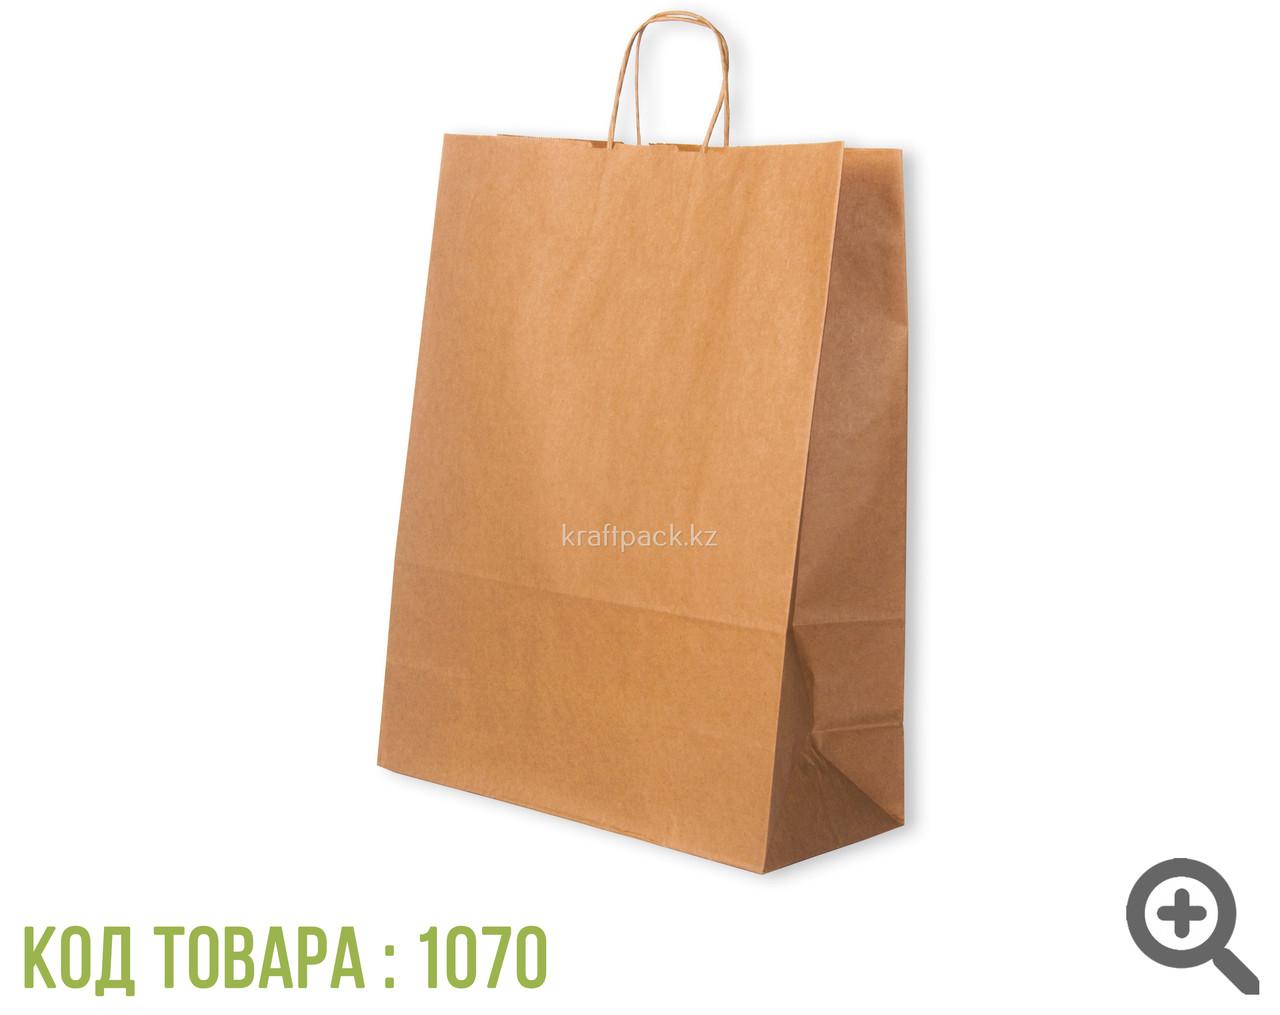 Бумажный пакет из крафт бумаги, бурый с ручкой 70гр 350*150*450 (150 шт/уп)